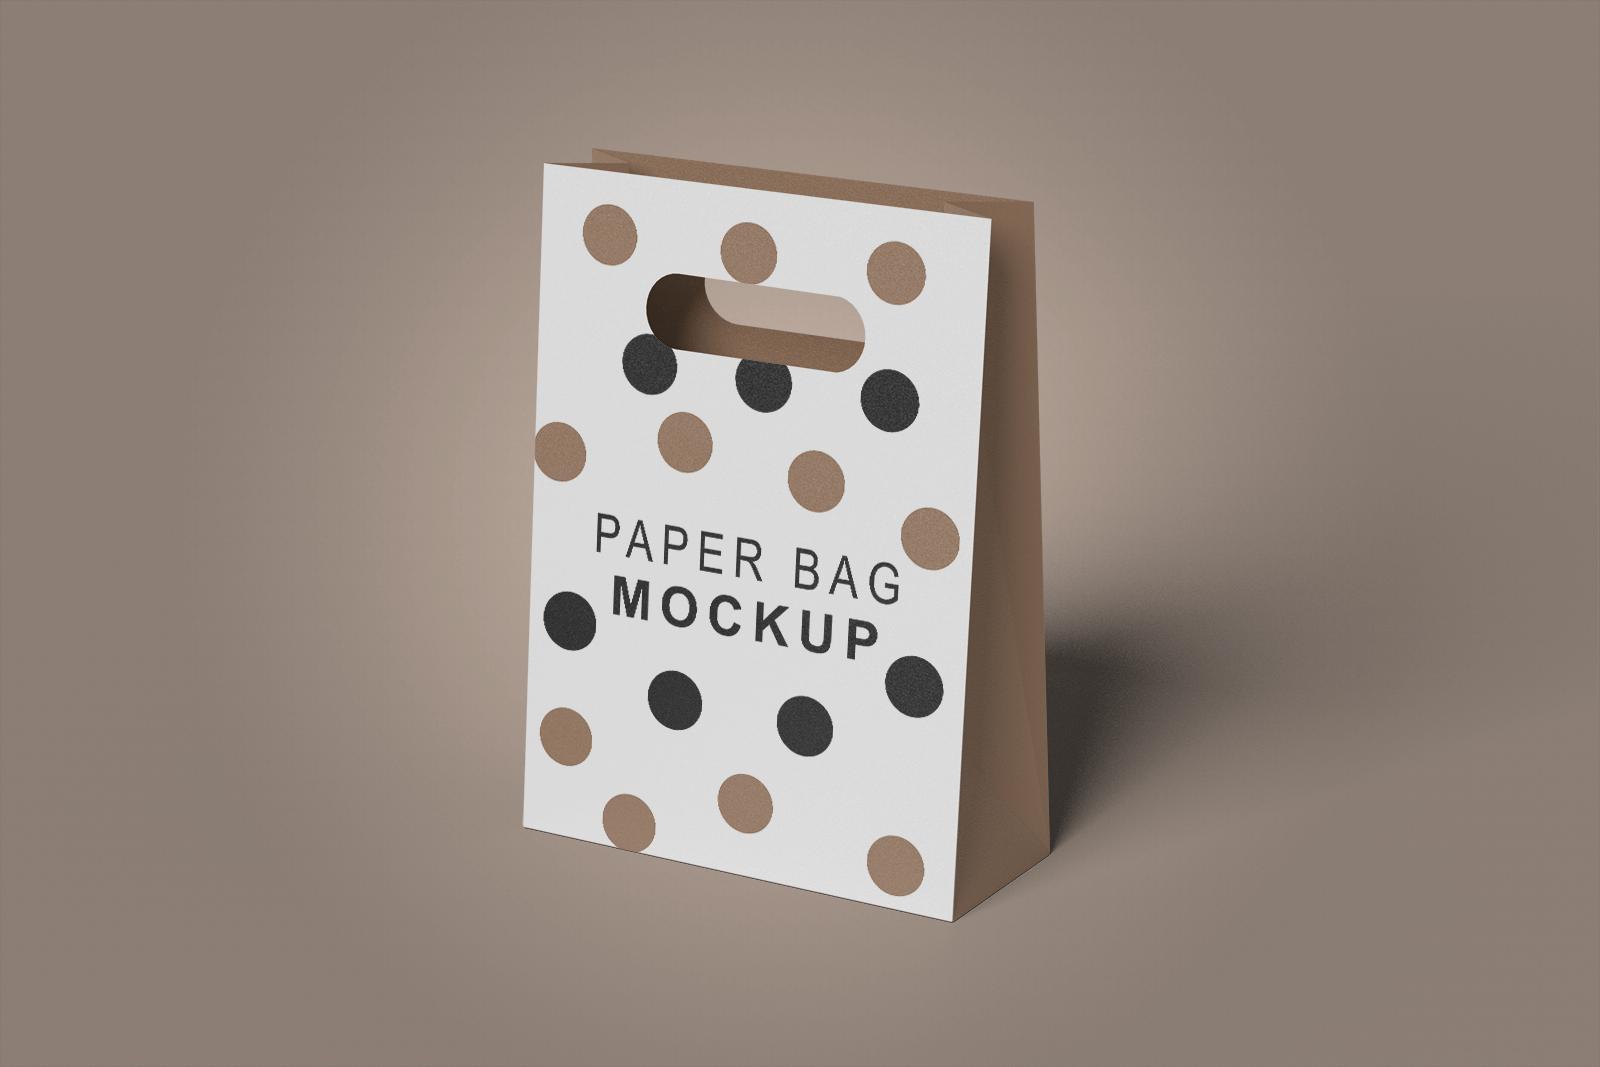 Free Foldable Paper Bag Mockup 1